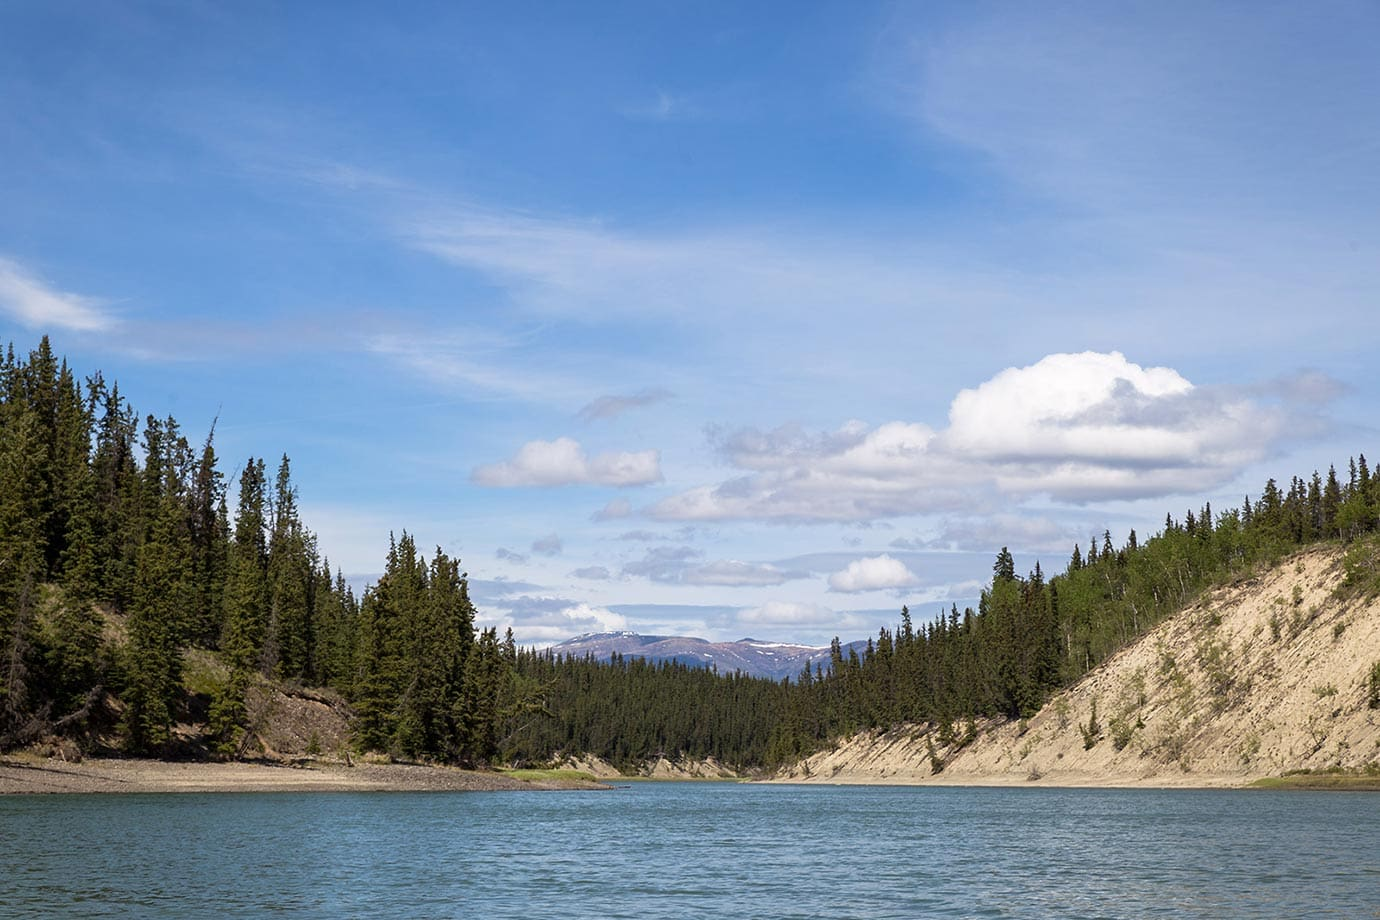 River Yukon